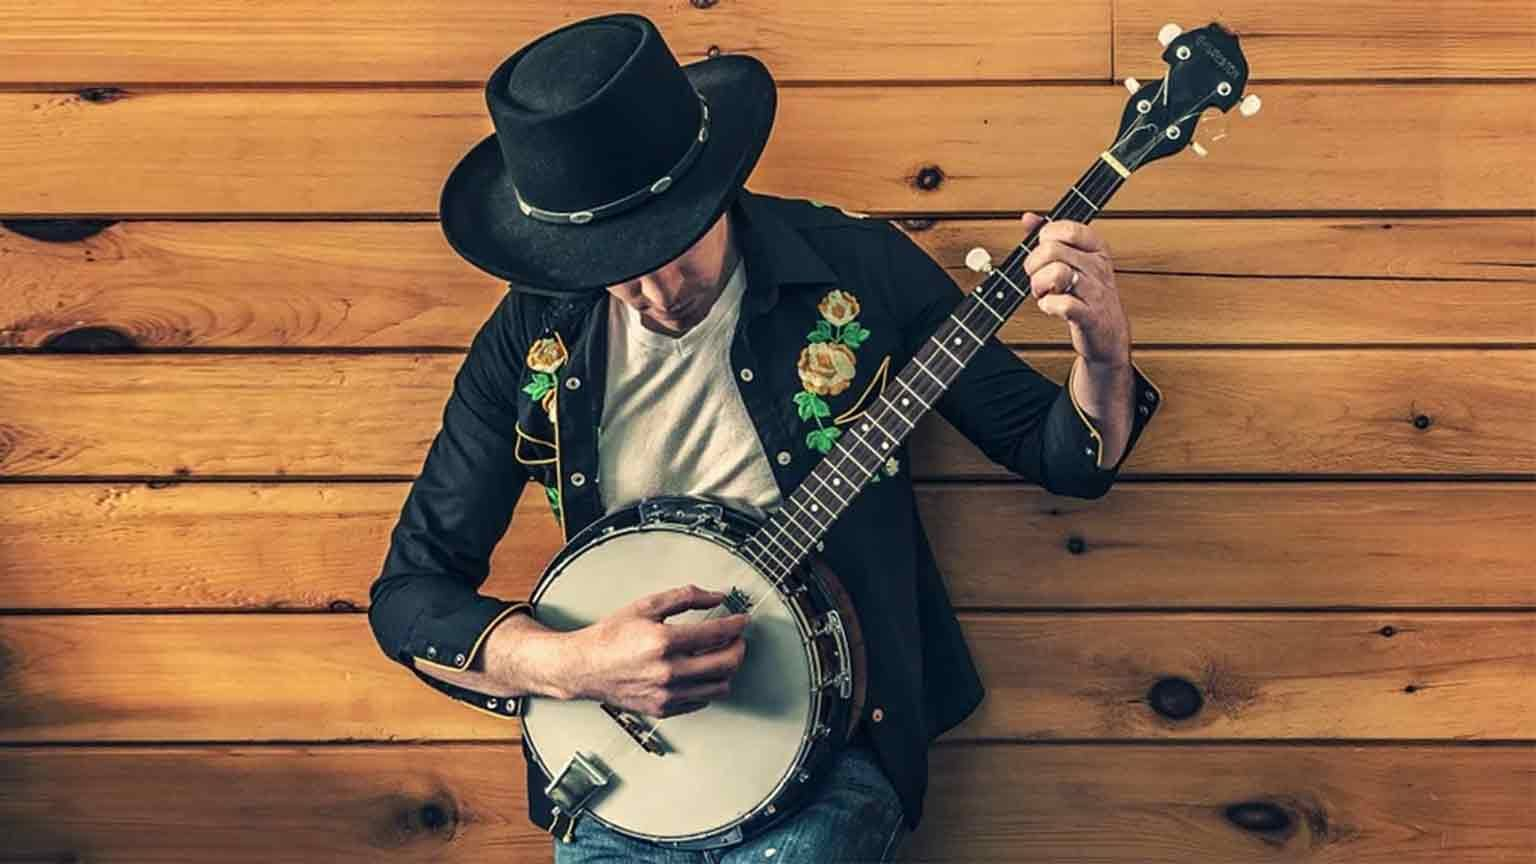 Musician playing a banjo